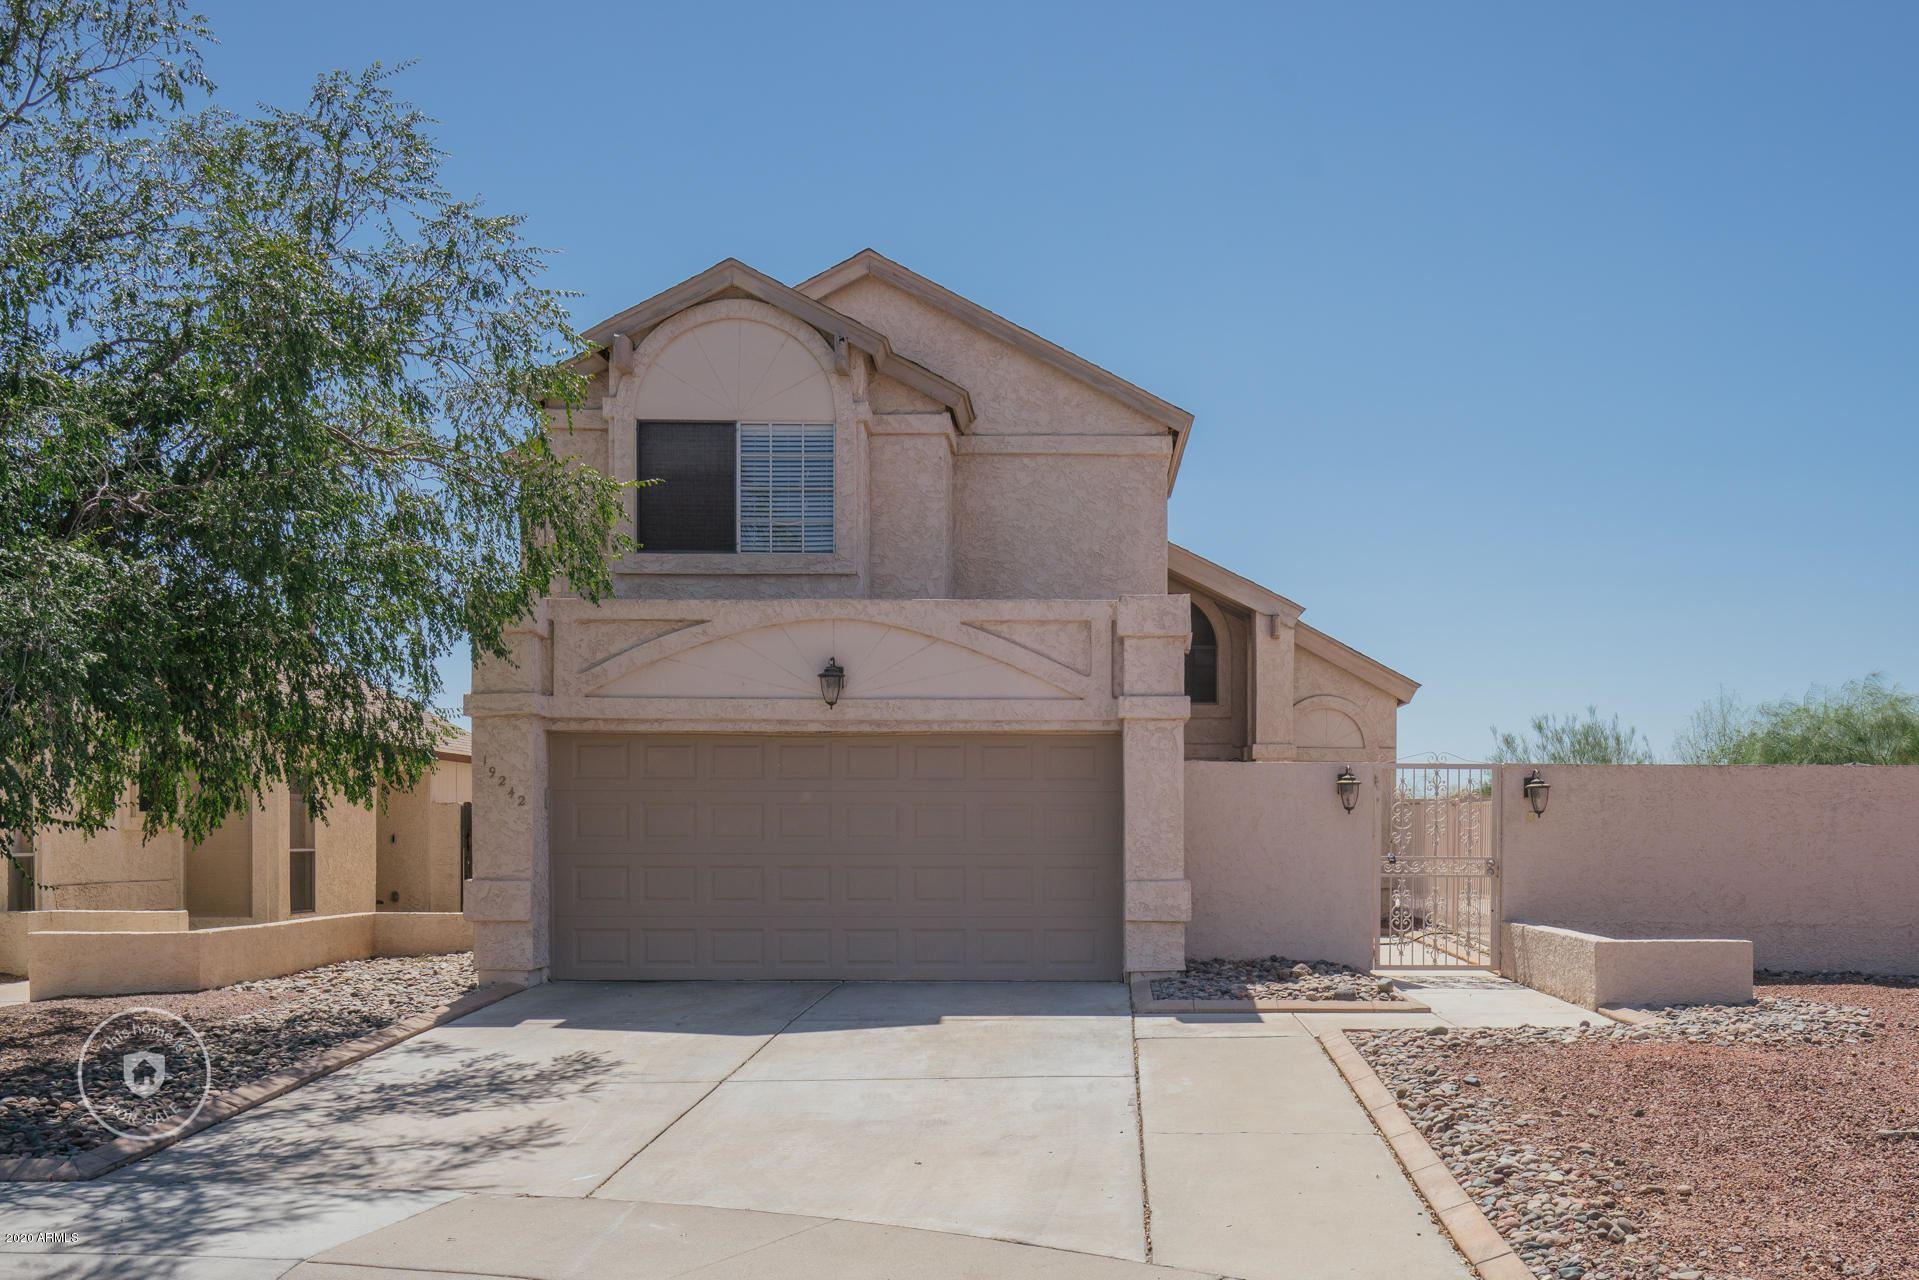 19242 N 4TH Street, Phoenix, AZ 85024 - #: 6100858